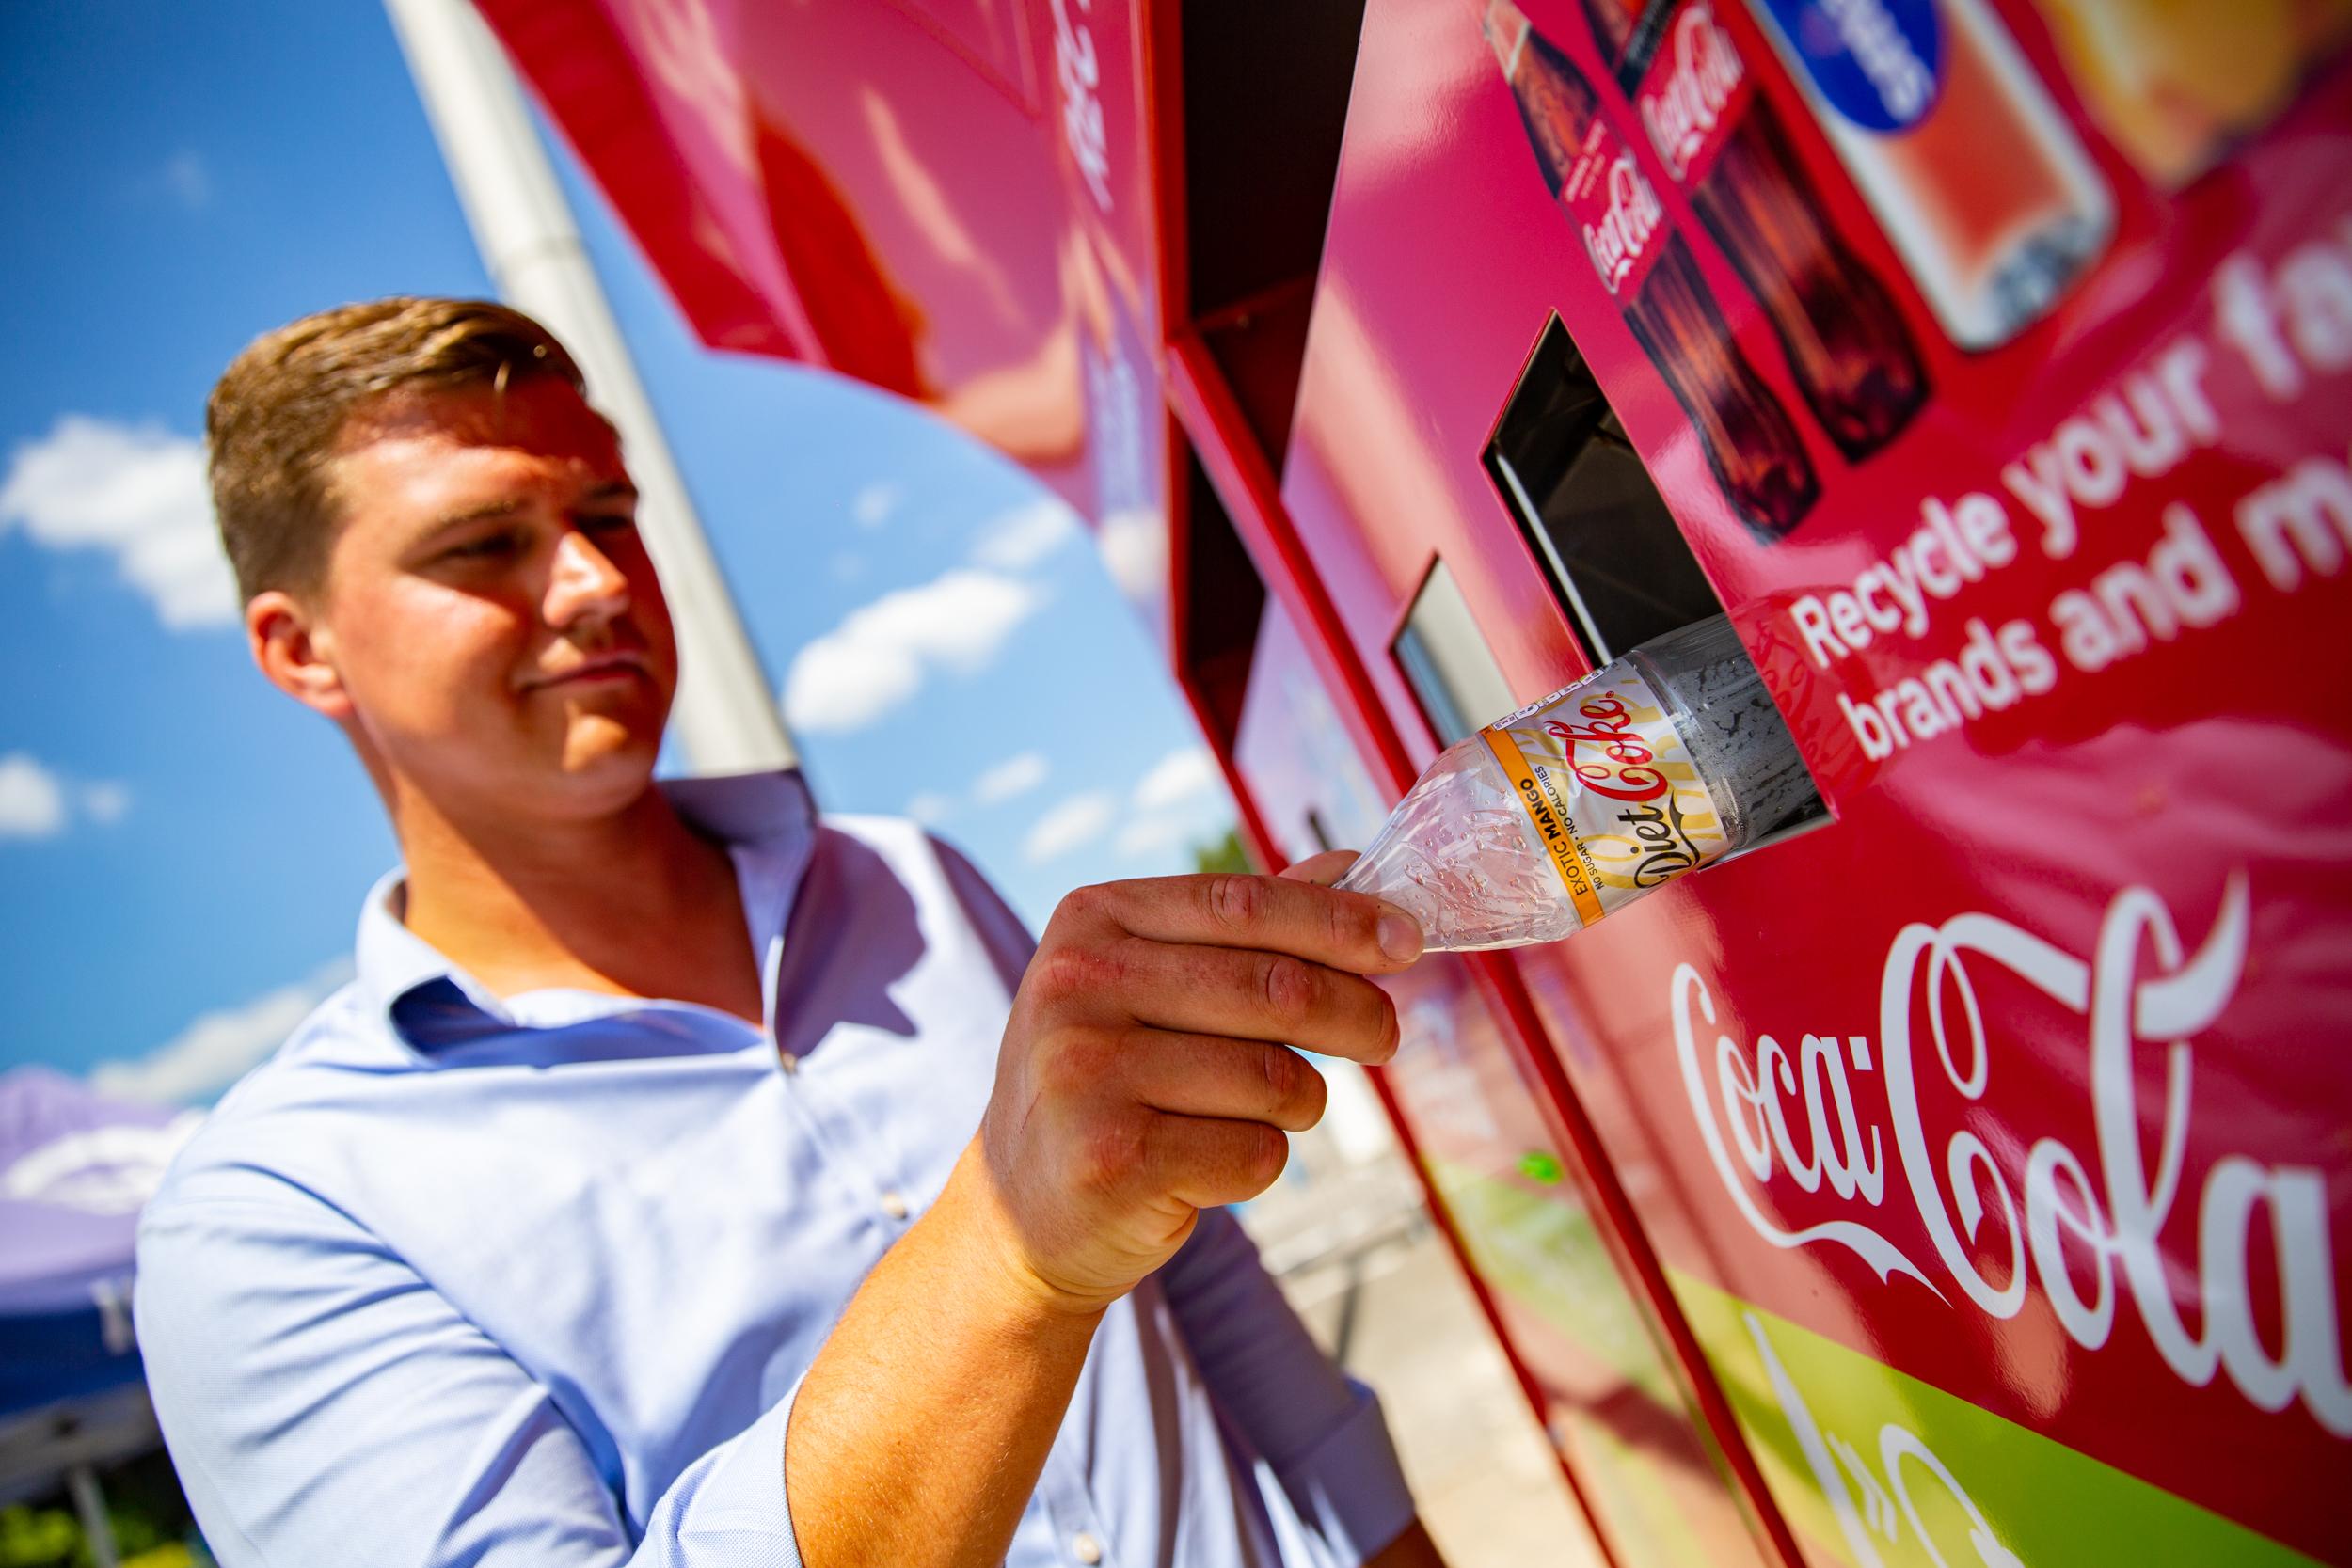 Coca-Cola cafecrush reverse vending recycling machine